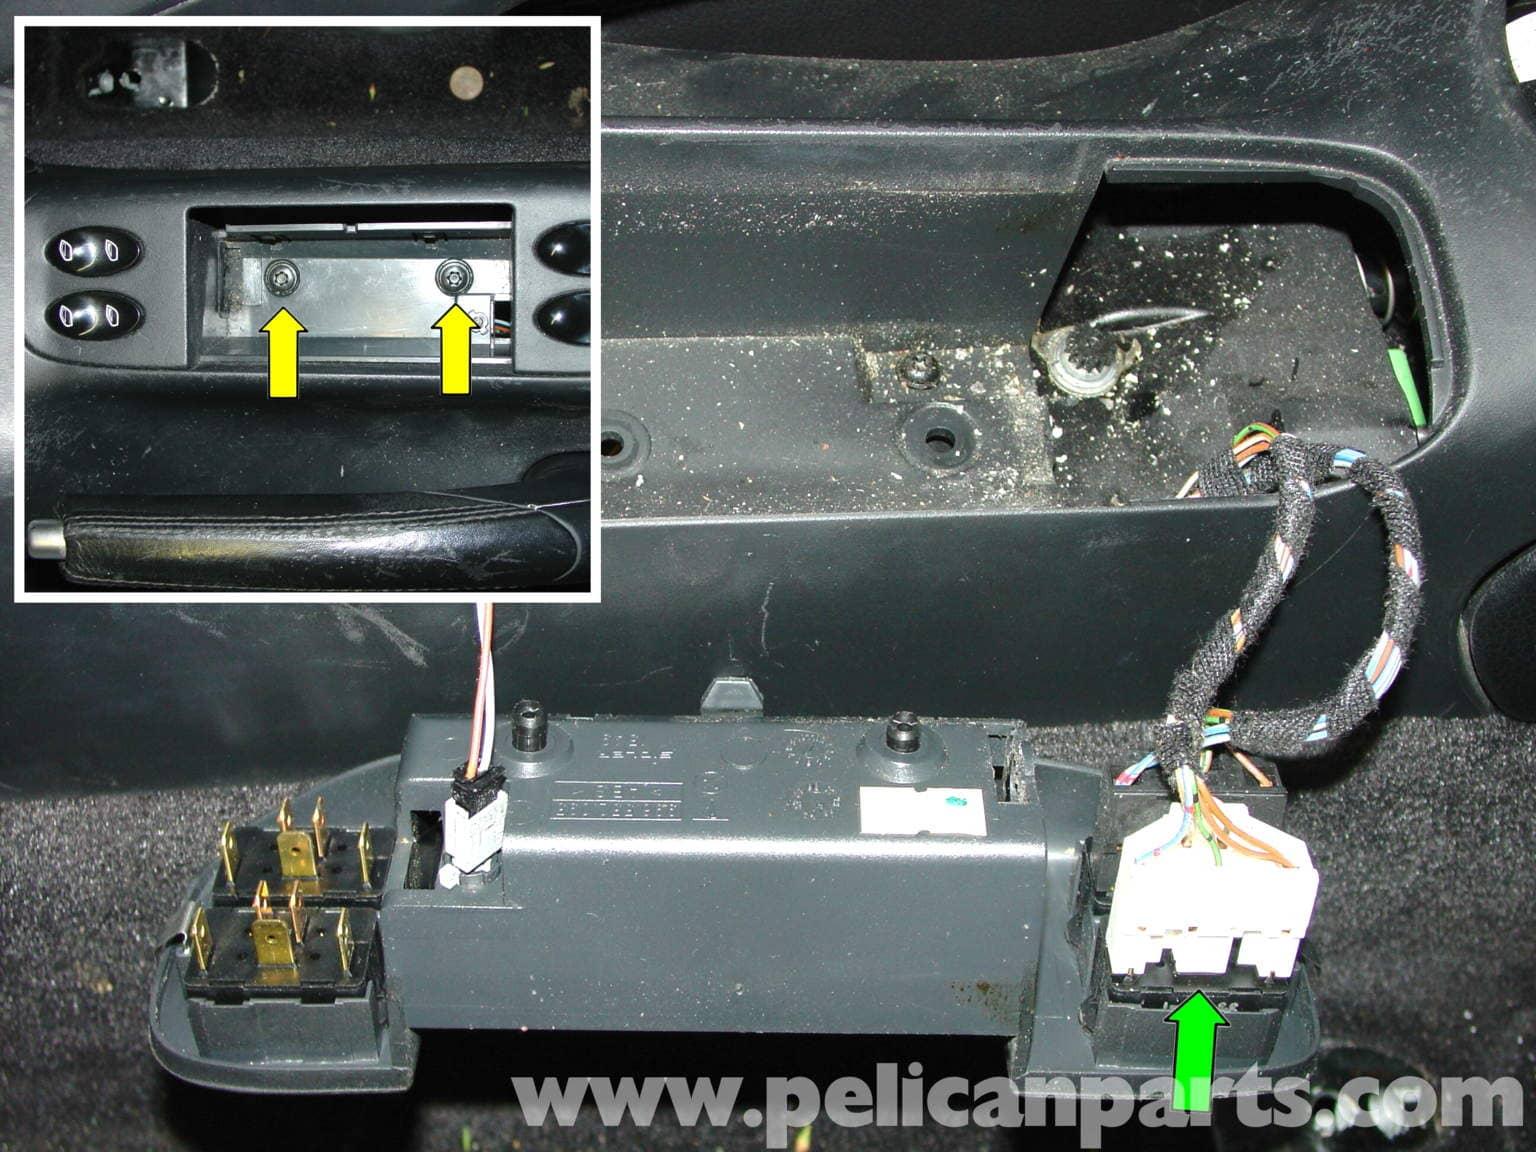 2007 Ford Crown Victoria Fuse Diagram Porsche 911 Carrera Window Regulator And Motor Replacement